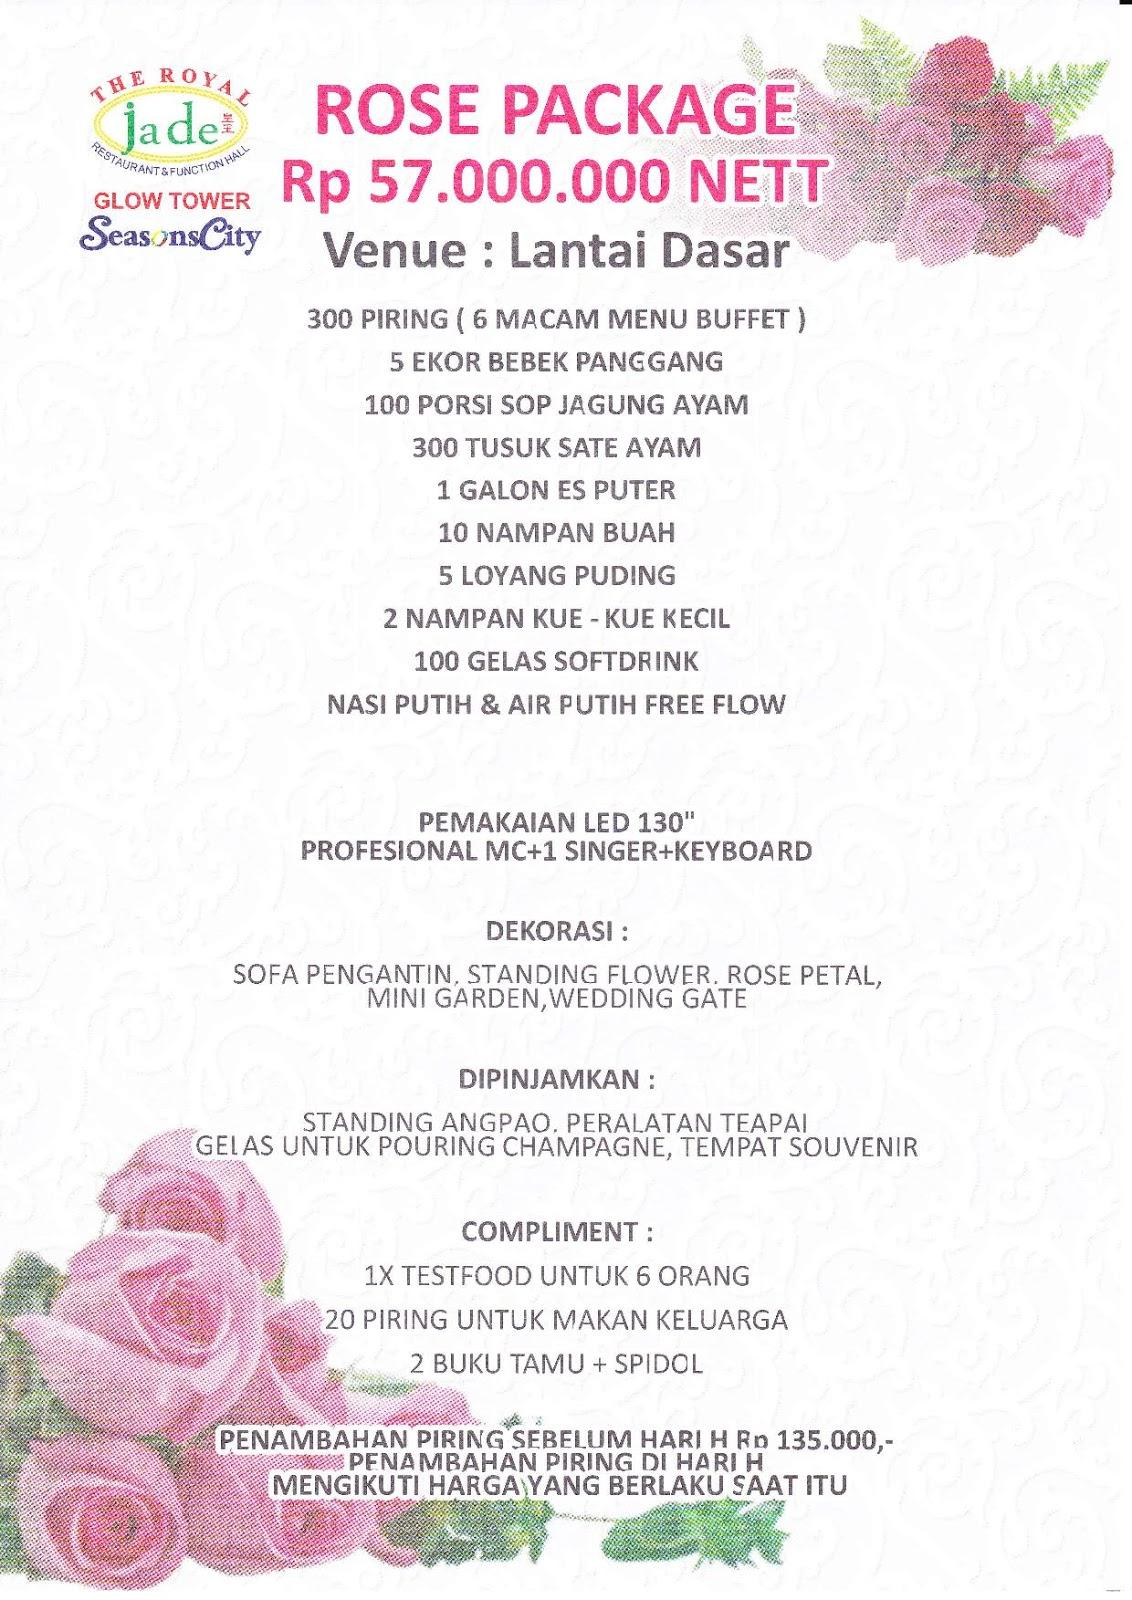 Paket Wedding Hotel Jakarta 2018 : paket, wedding, hotel, jakarta, Wedding, Royal, Weddings